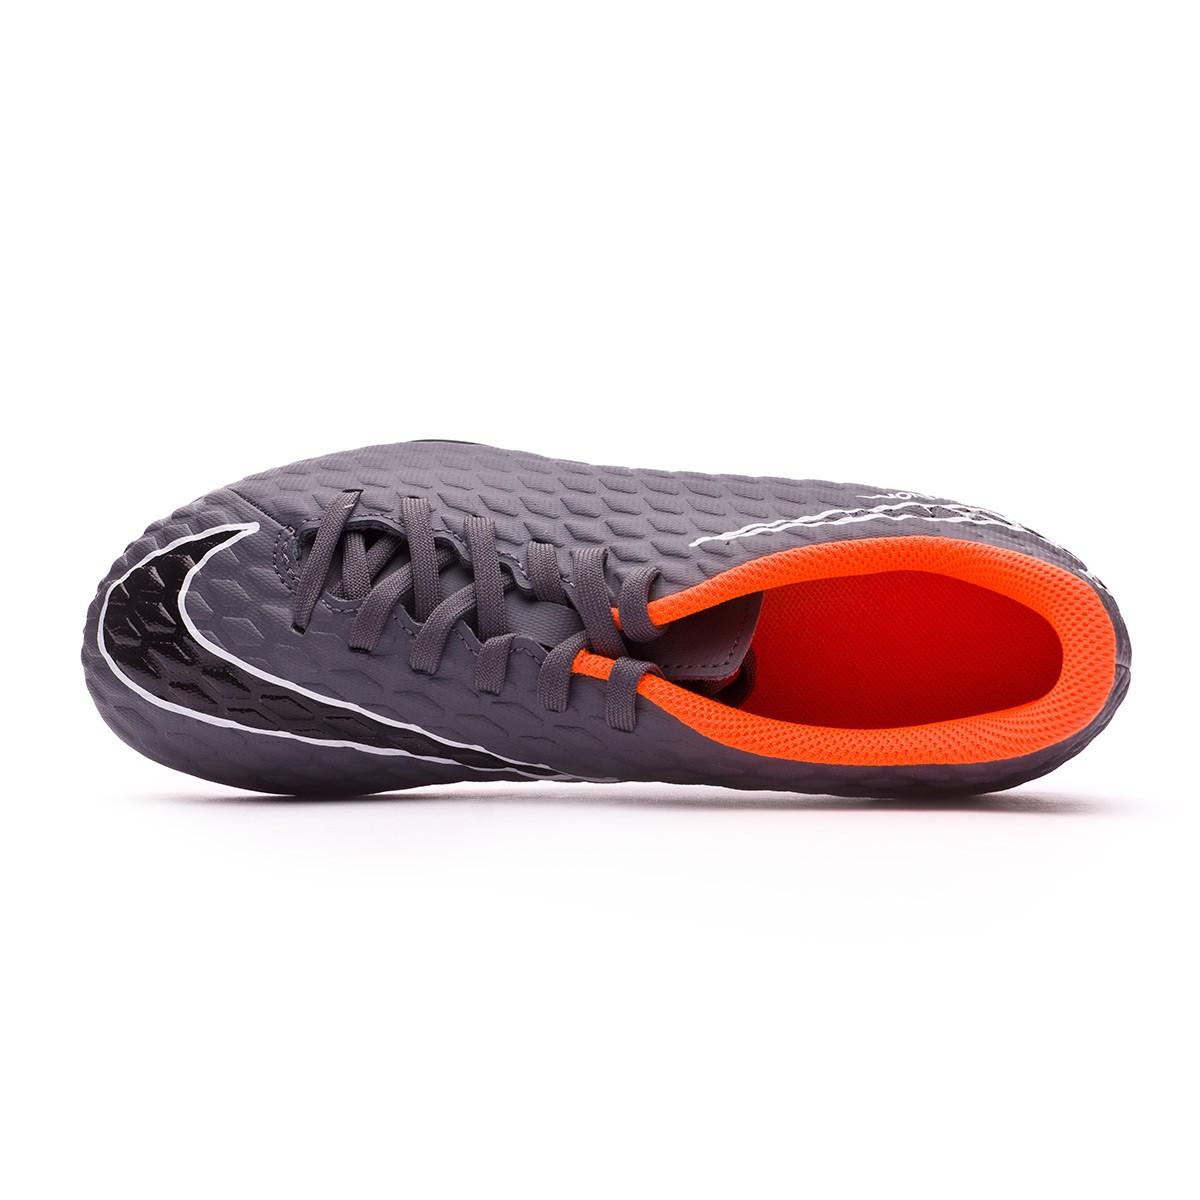 b7e0e3453 Football Boots Nike Kids Hypervenom Phantom III Club FG Dark grey-Total  orange-White - Football store Fútbol Emotion